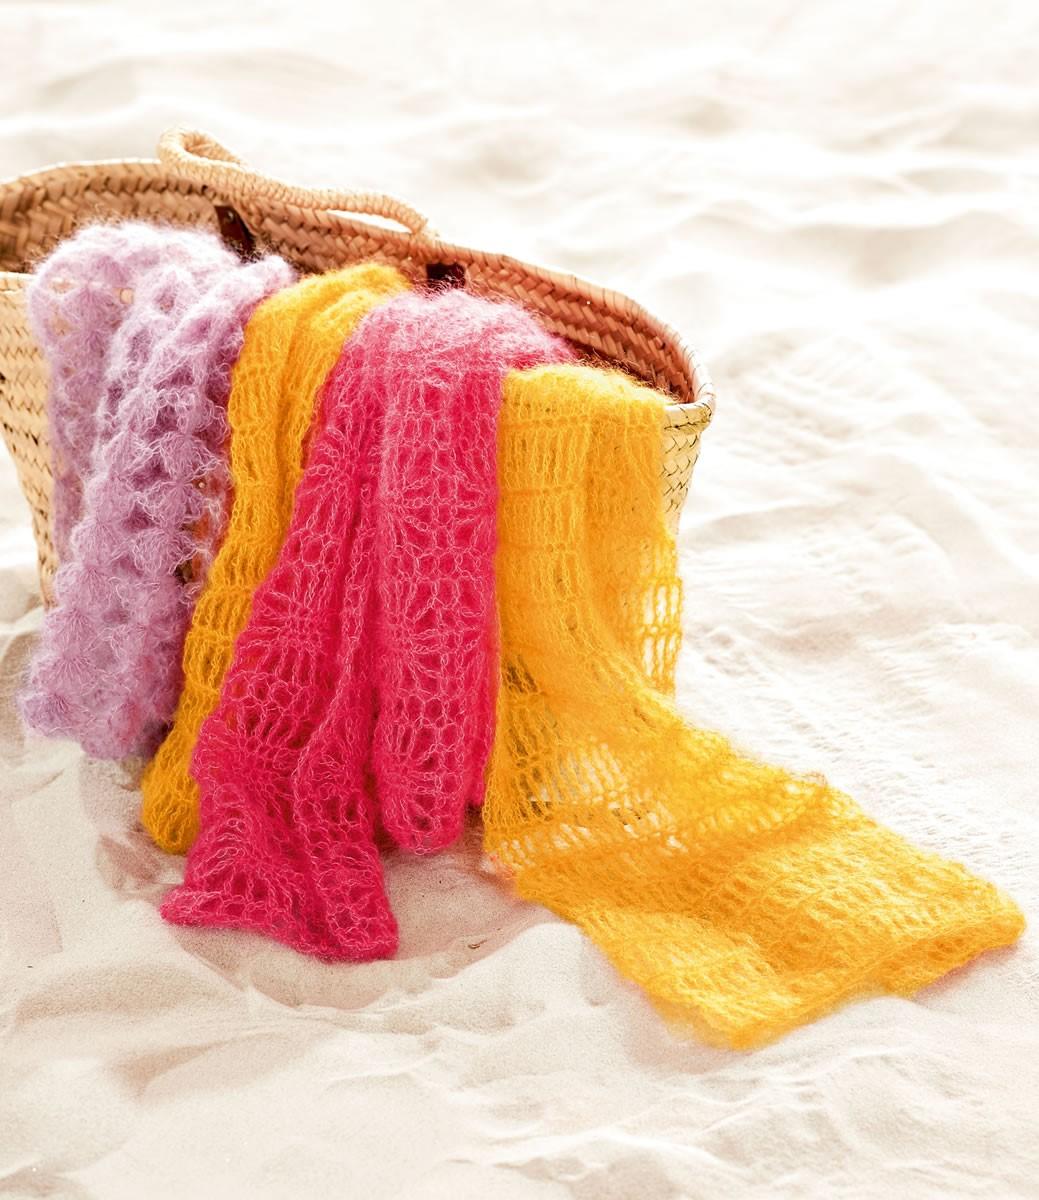 Lana Grossa Тонкий малиновый ажурный шарф Silkhair